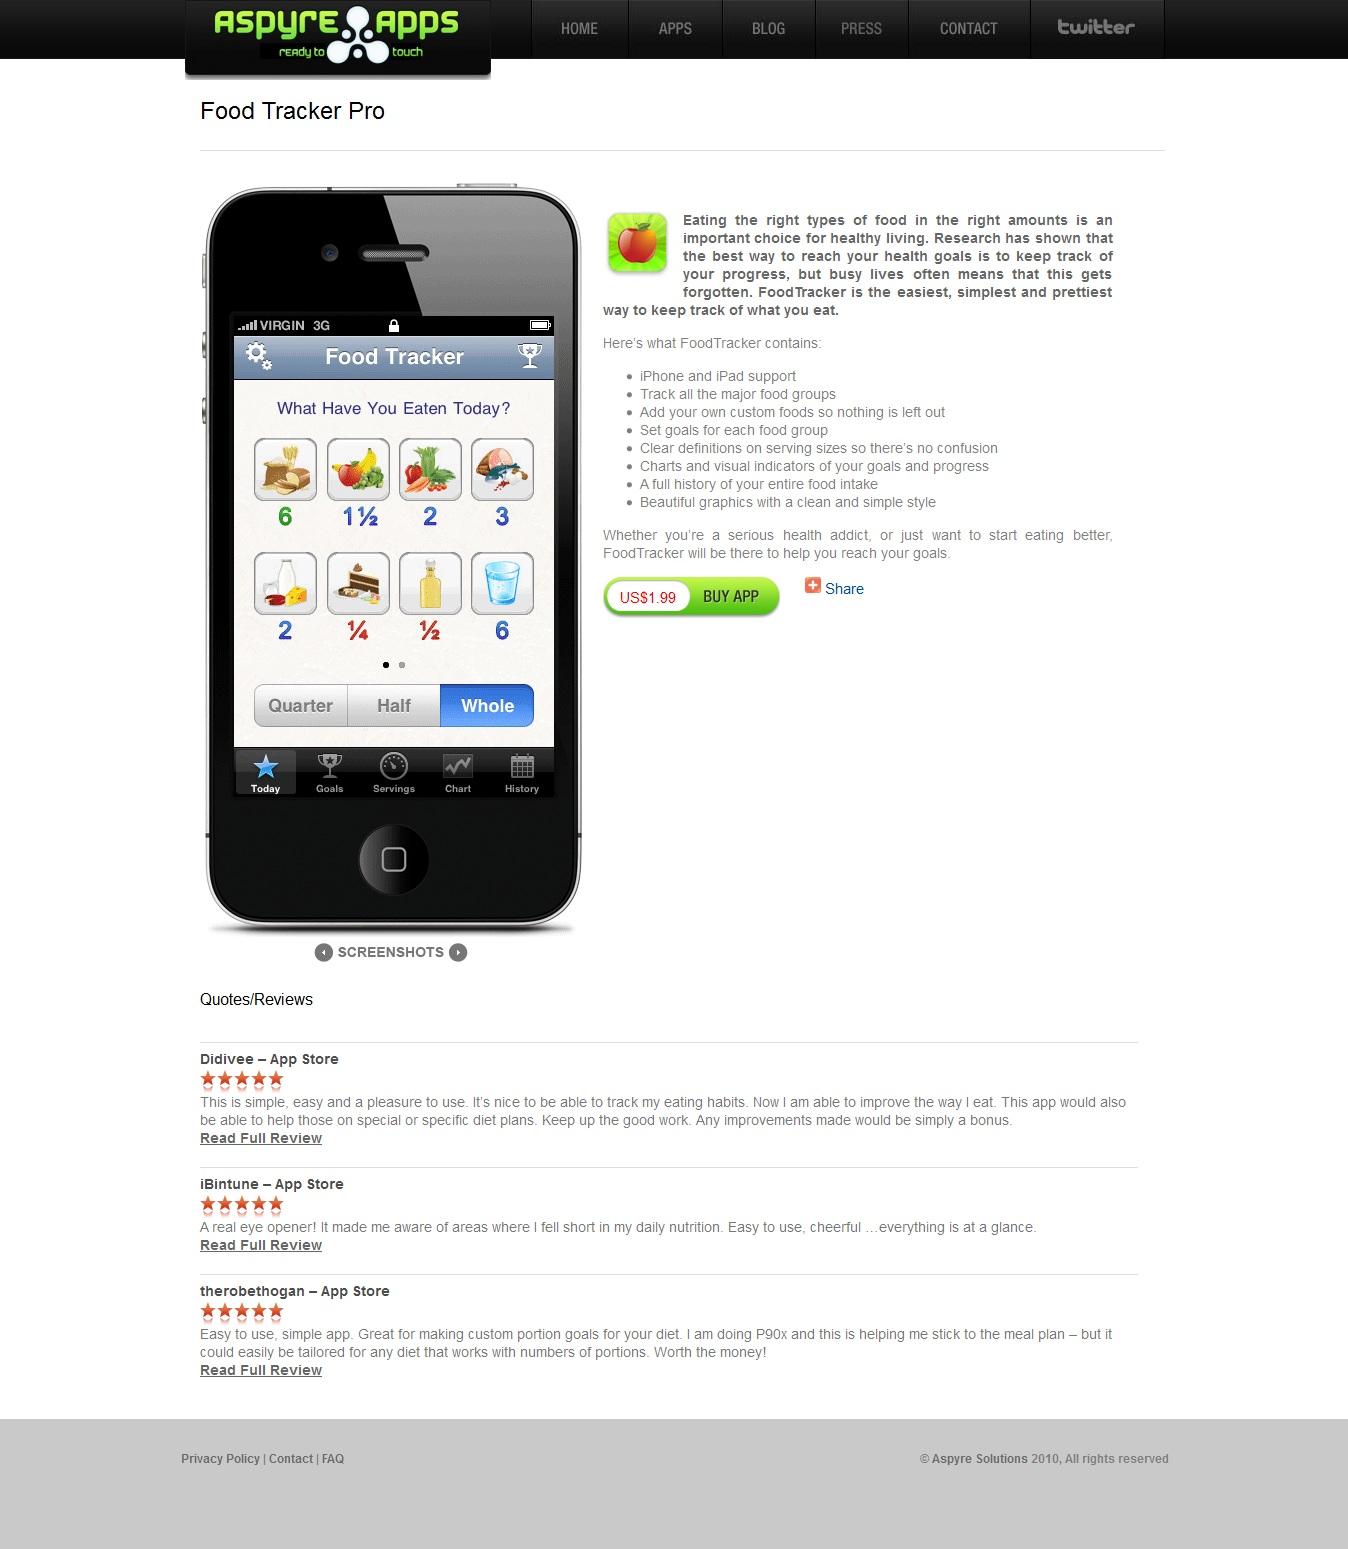 aspyre apps product page design